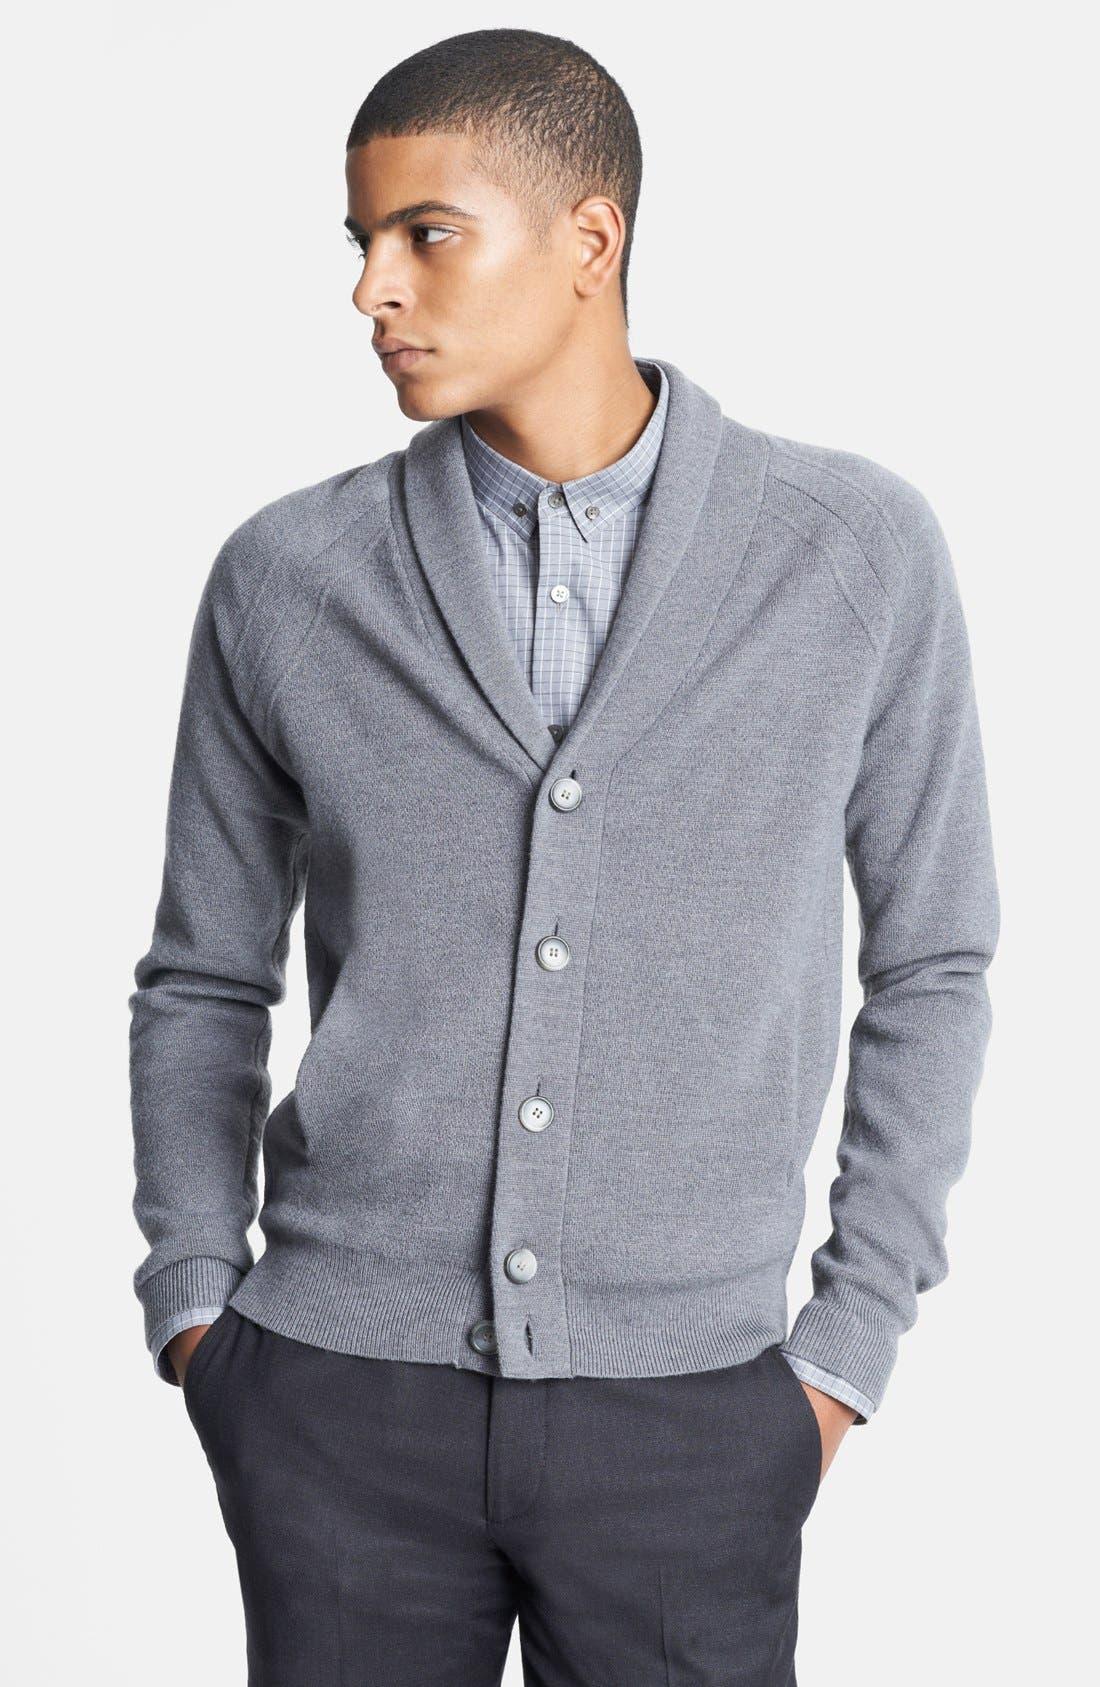 Alternate Image 1 Selected - Theory 'Adan' Wool Sweater